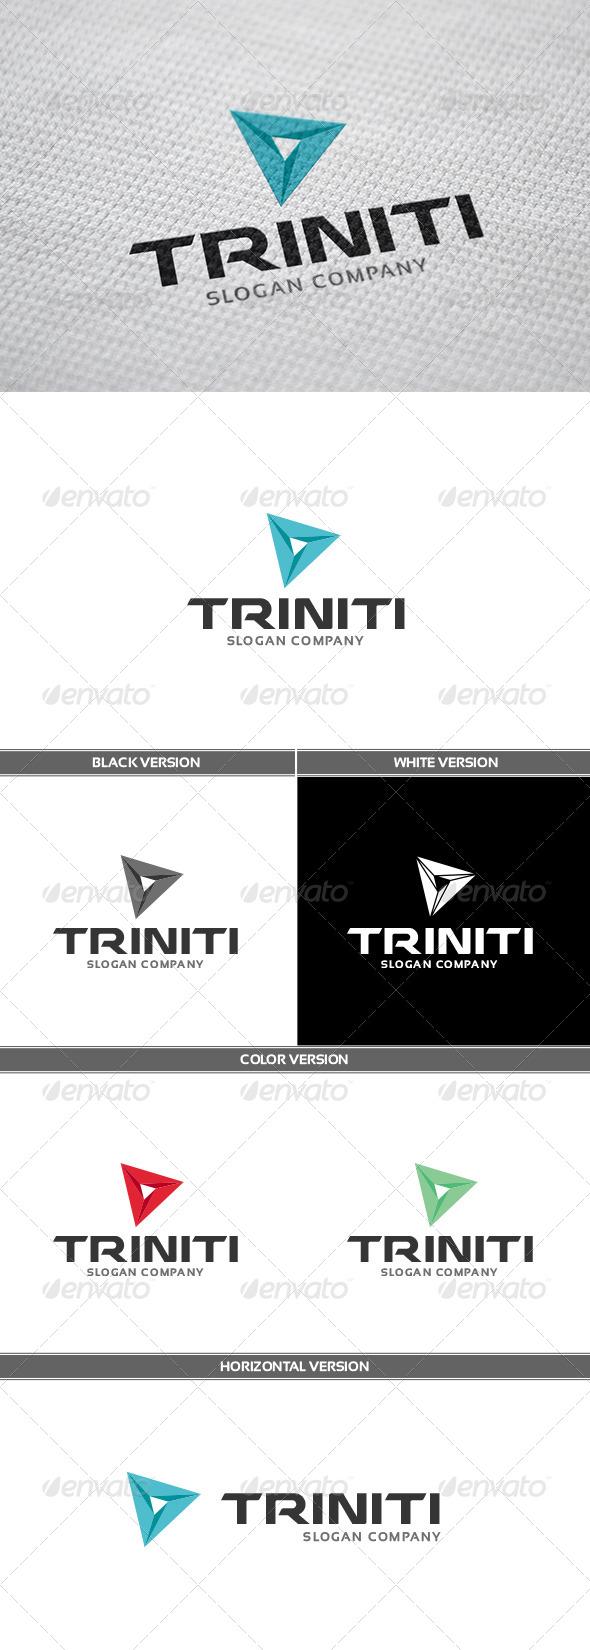 Triniti Logo